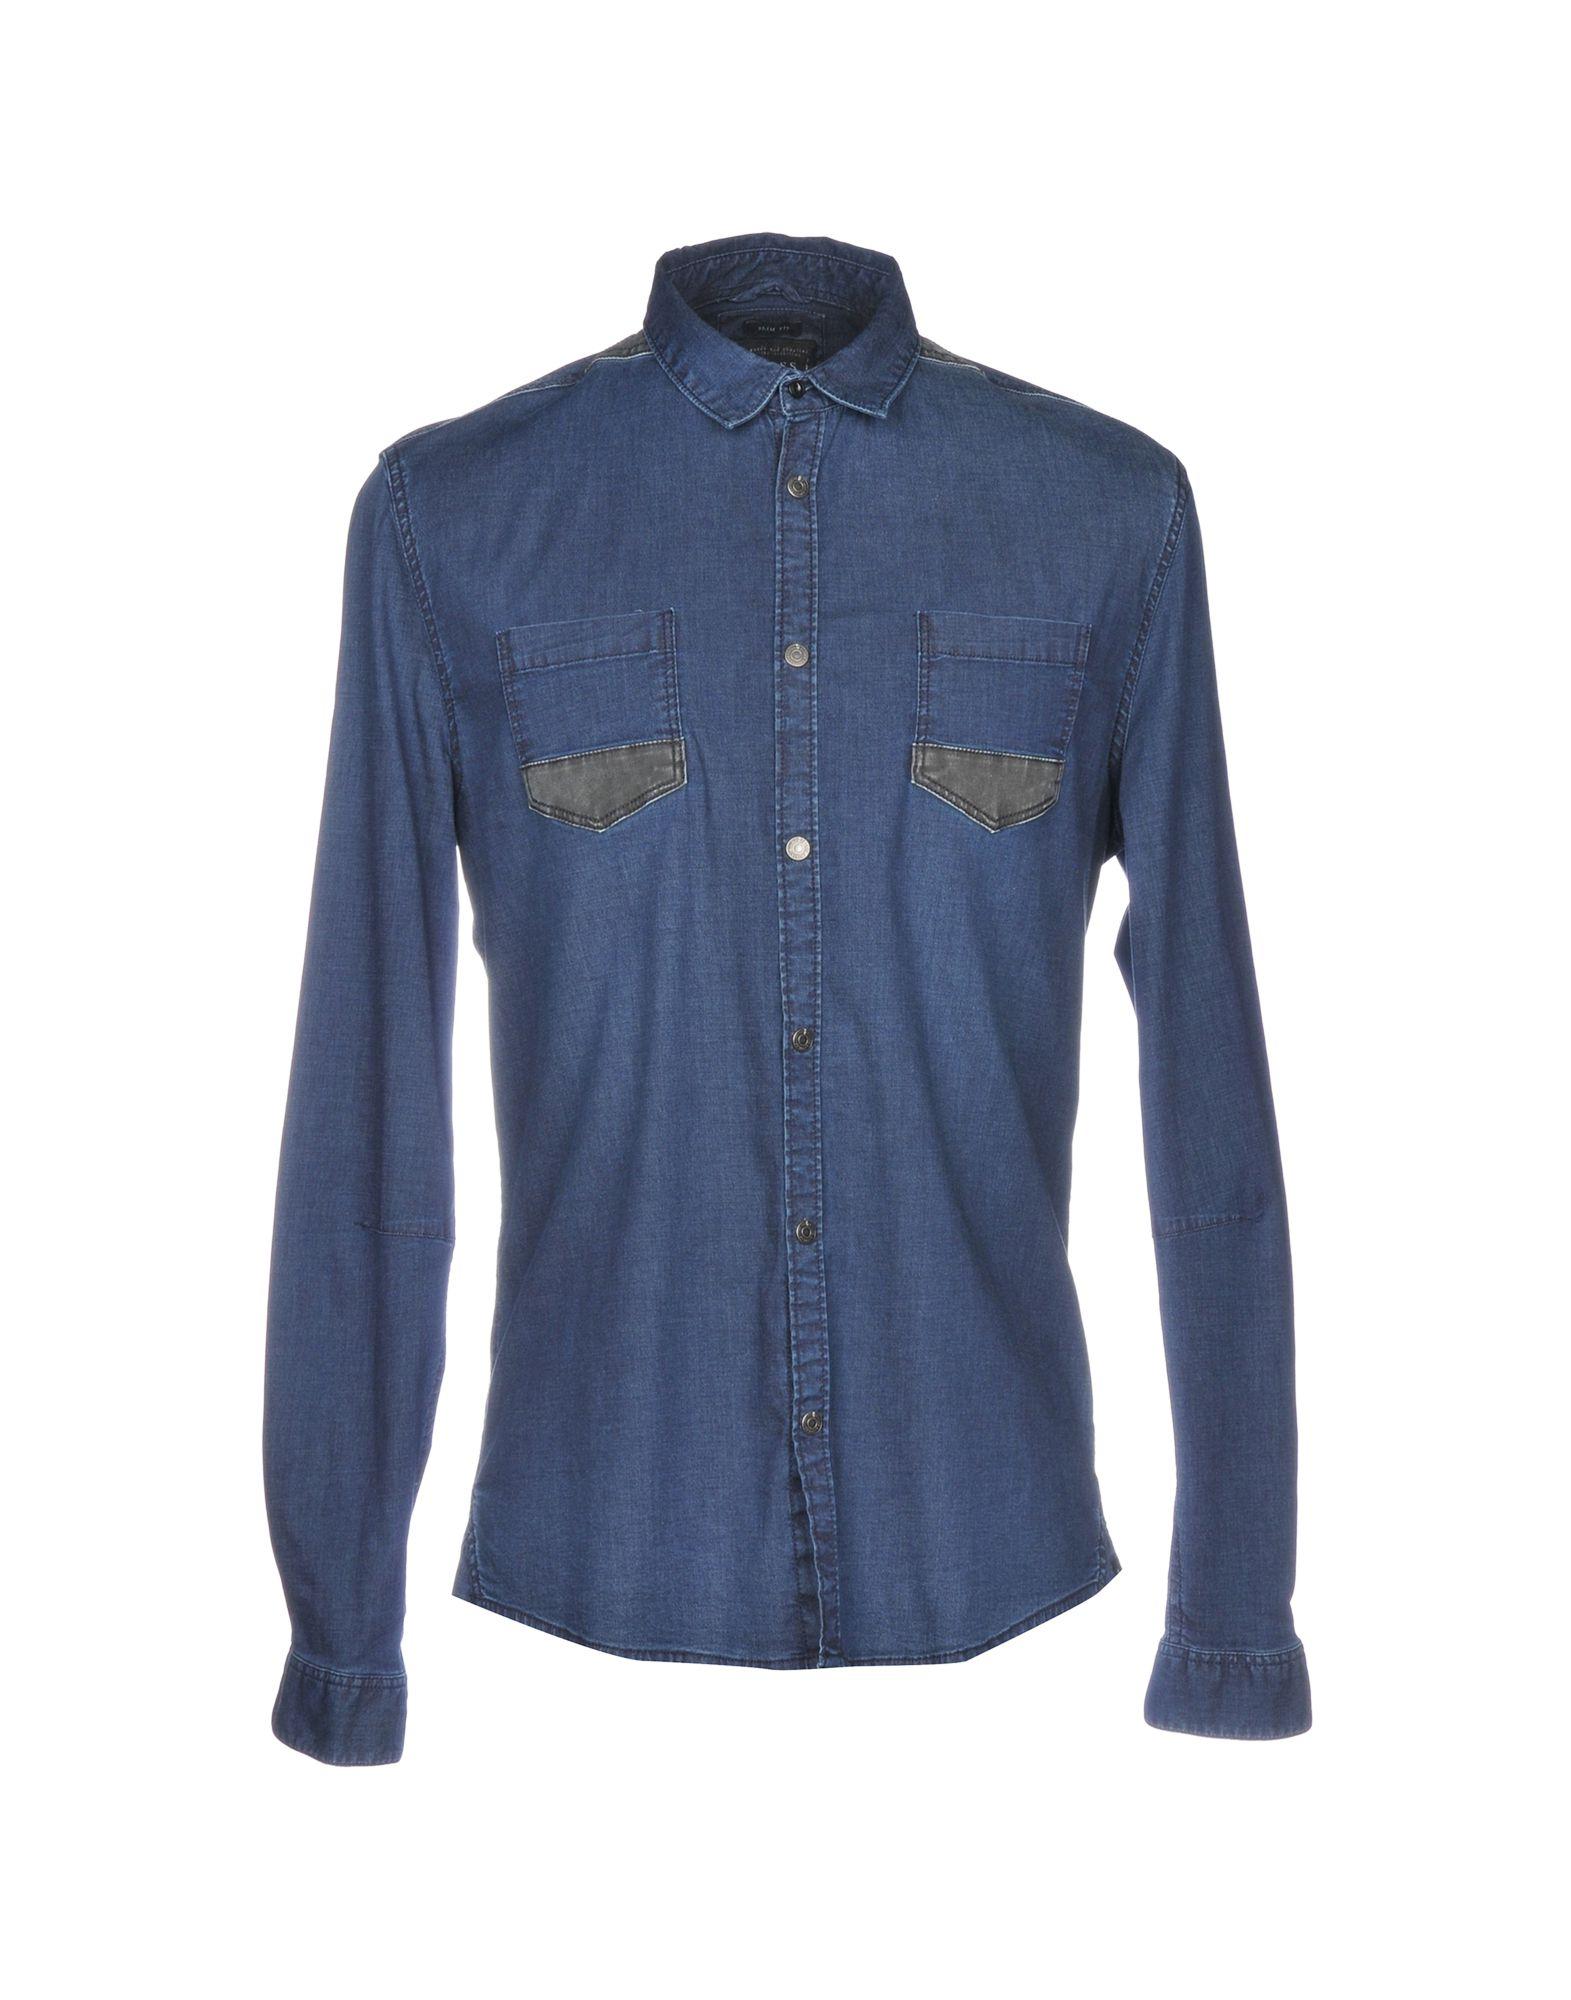 GUESS Джинсовая рубашка рубашка guess w81h01 w7zk0 a000